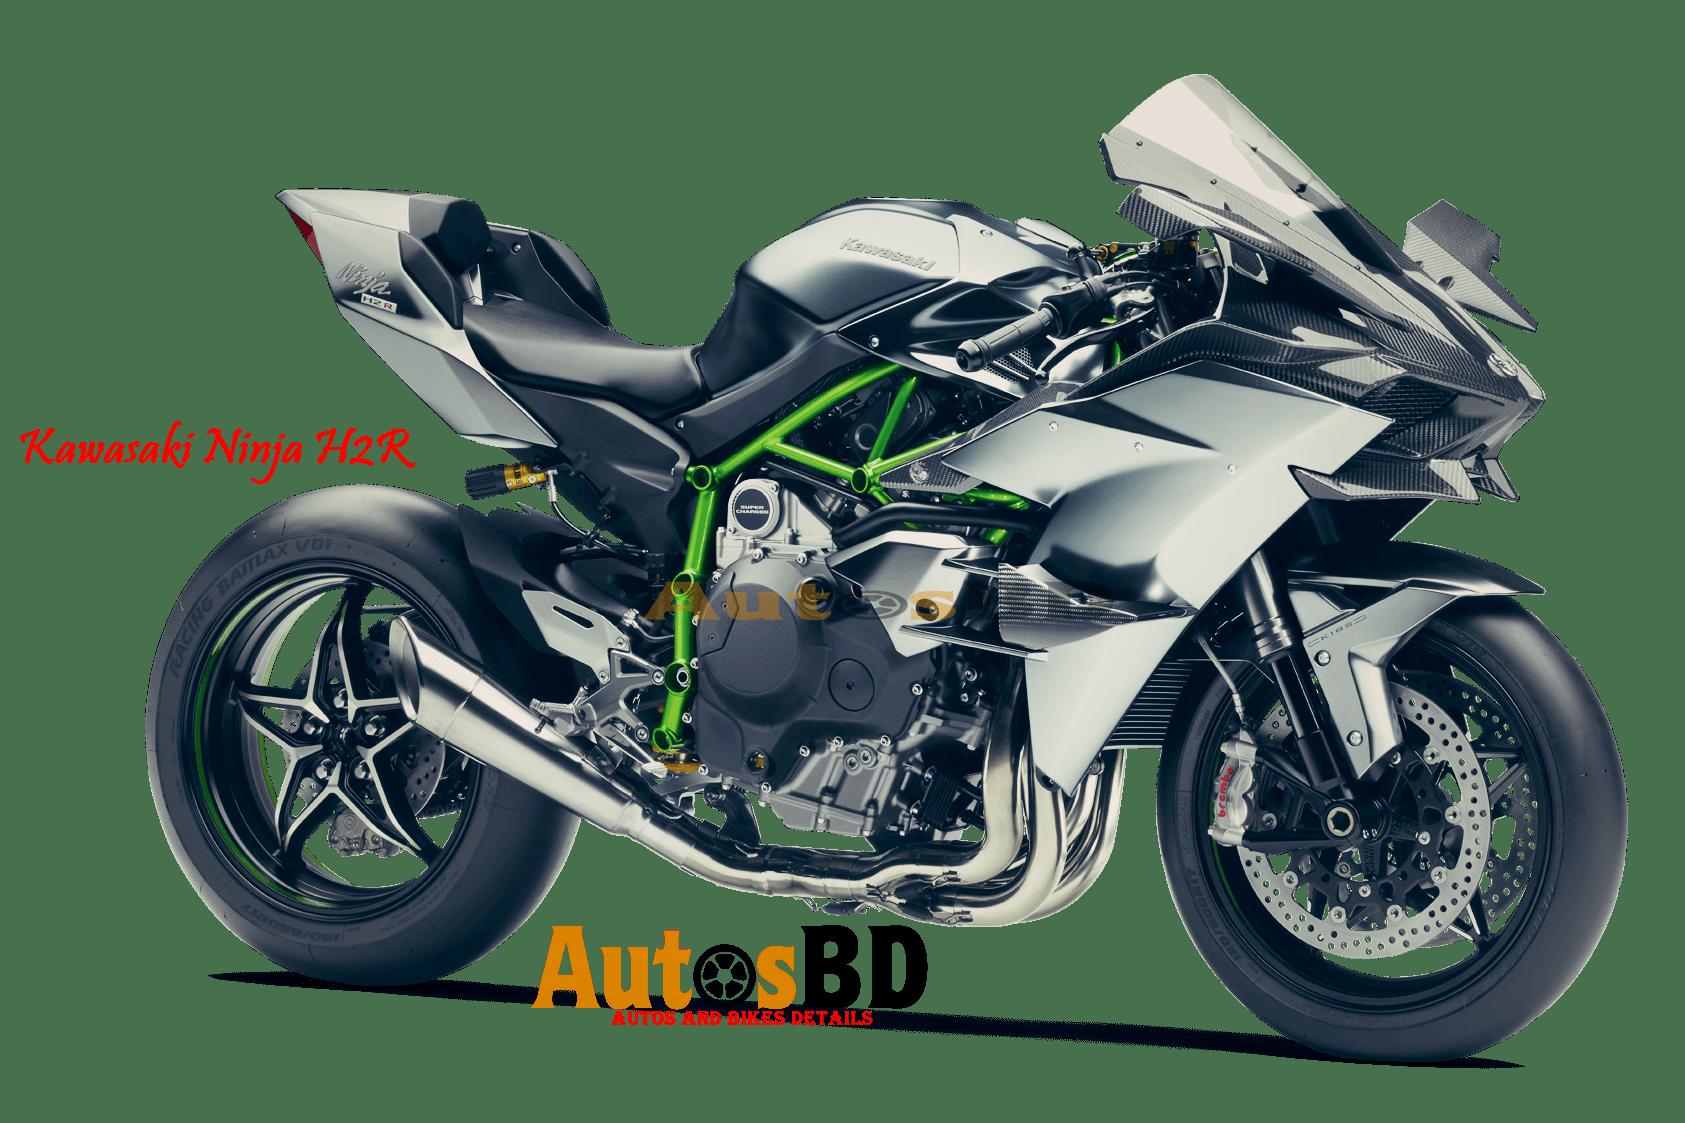 Kawasaki Ninja H2R Motorcycle Specification